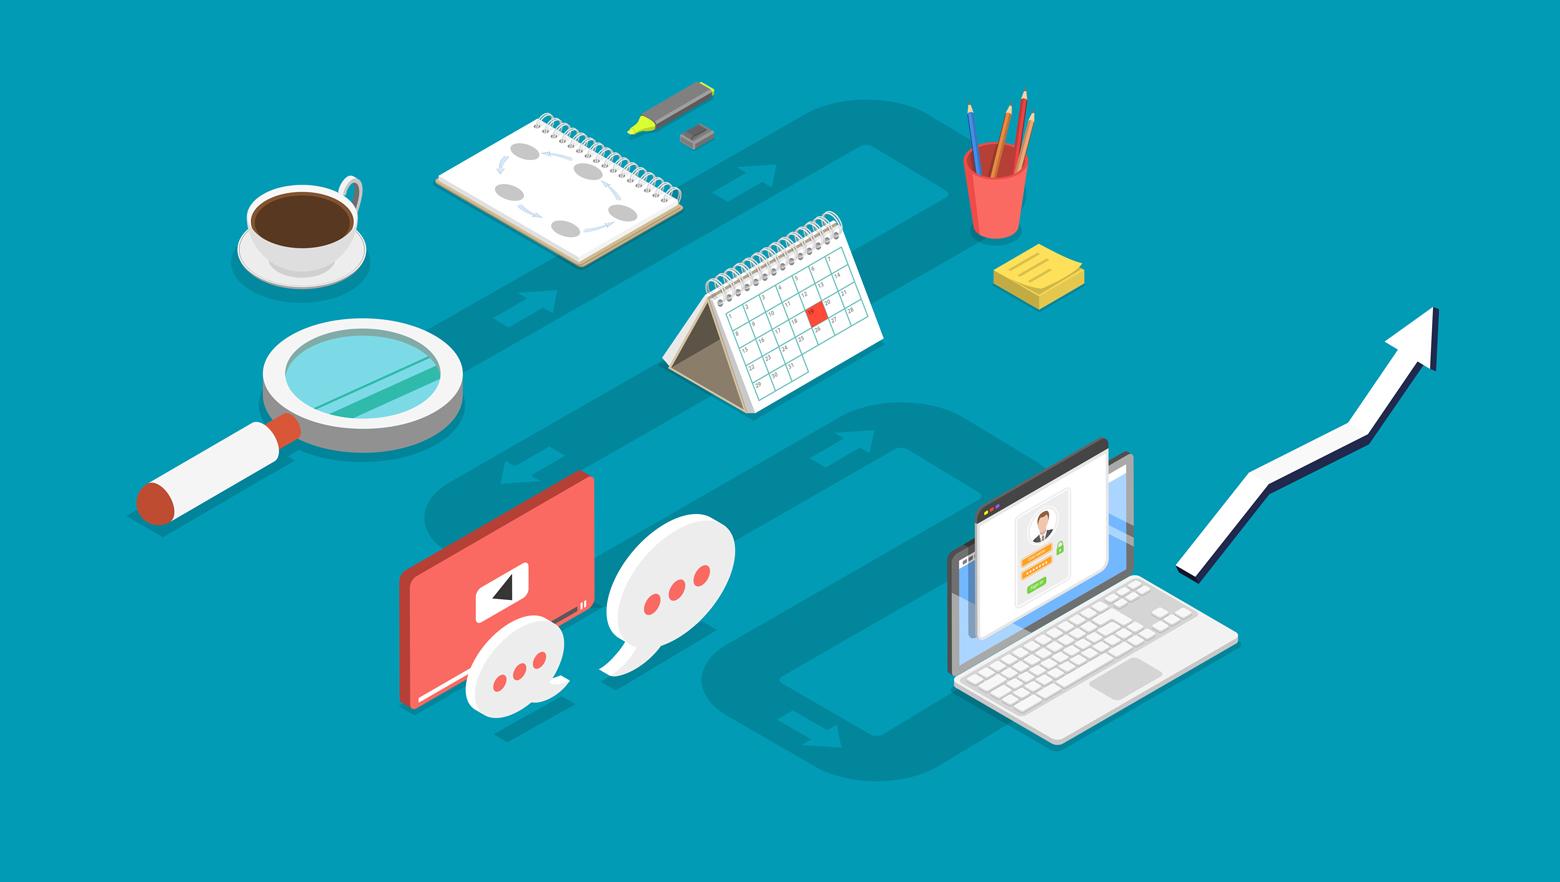 Our digital design process